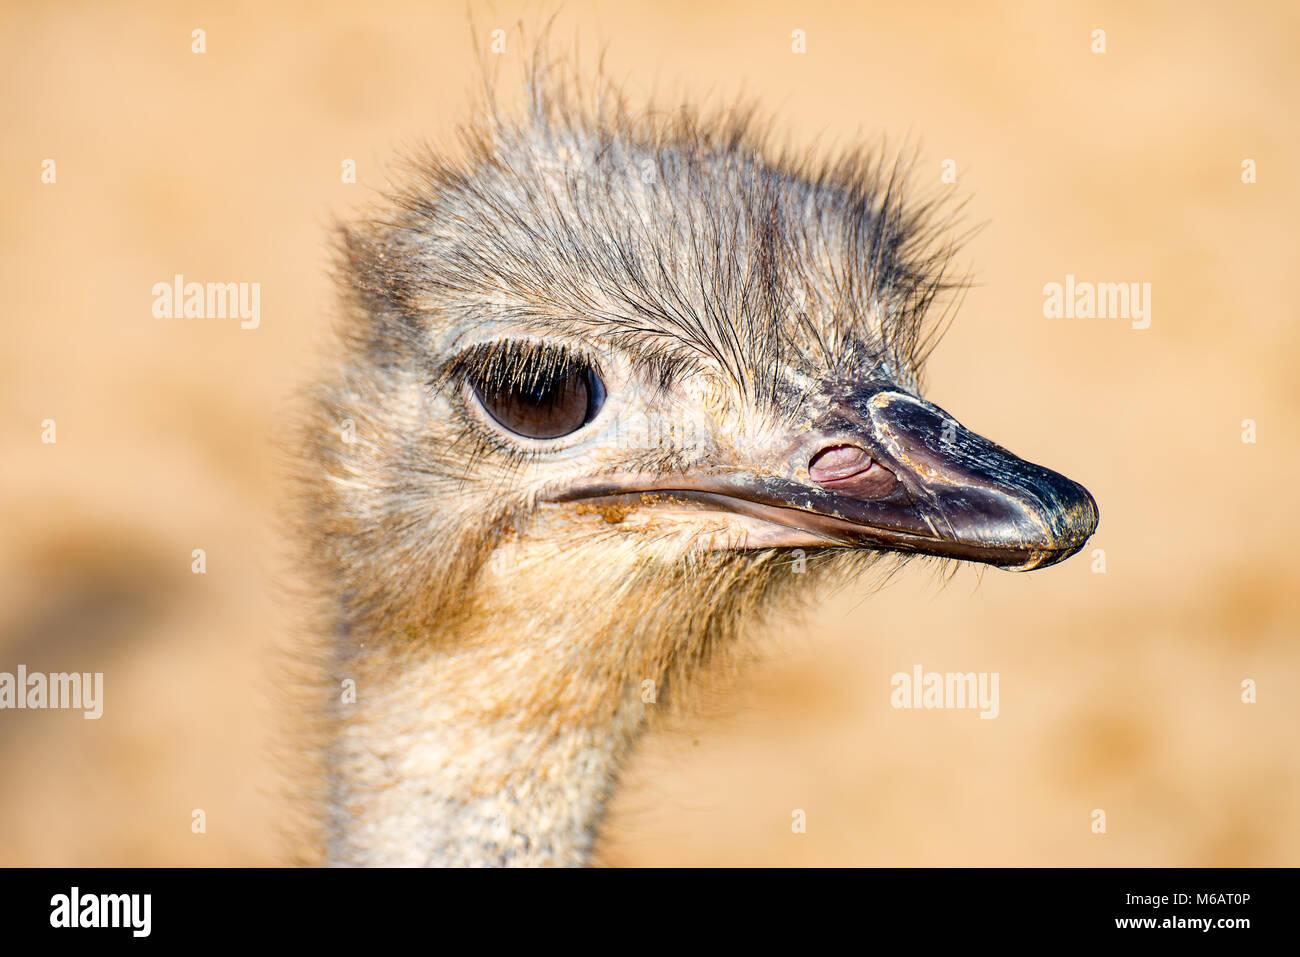 The head of a Emu Bird look forward 1 - Stock Image